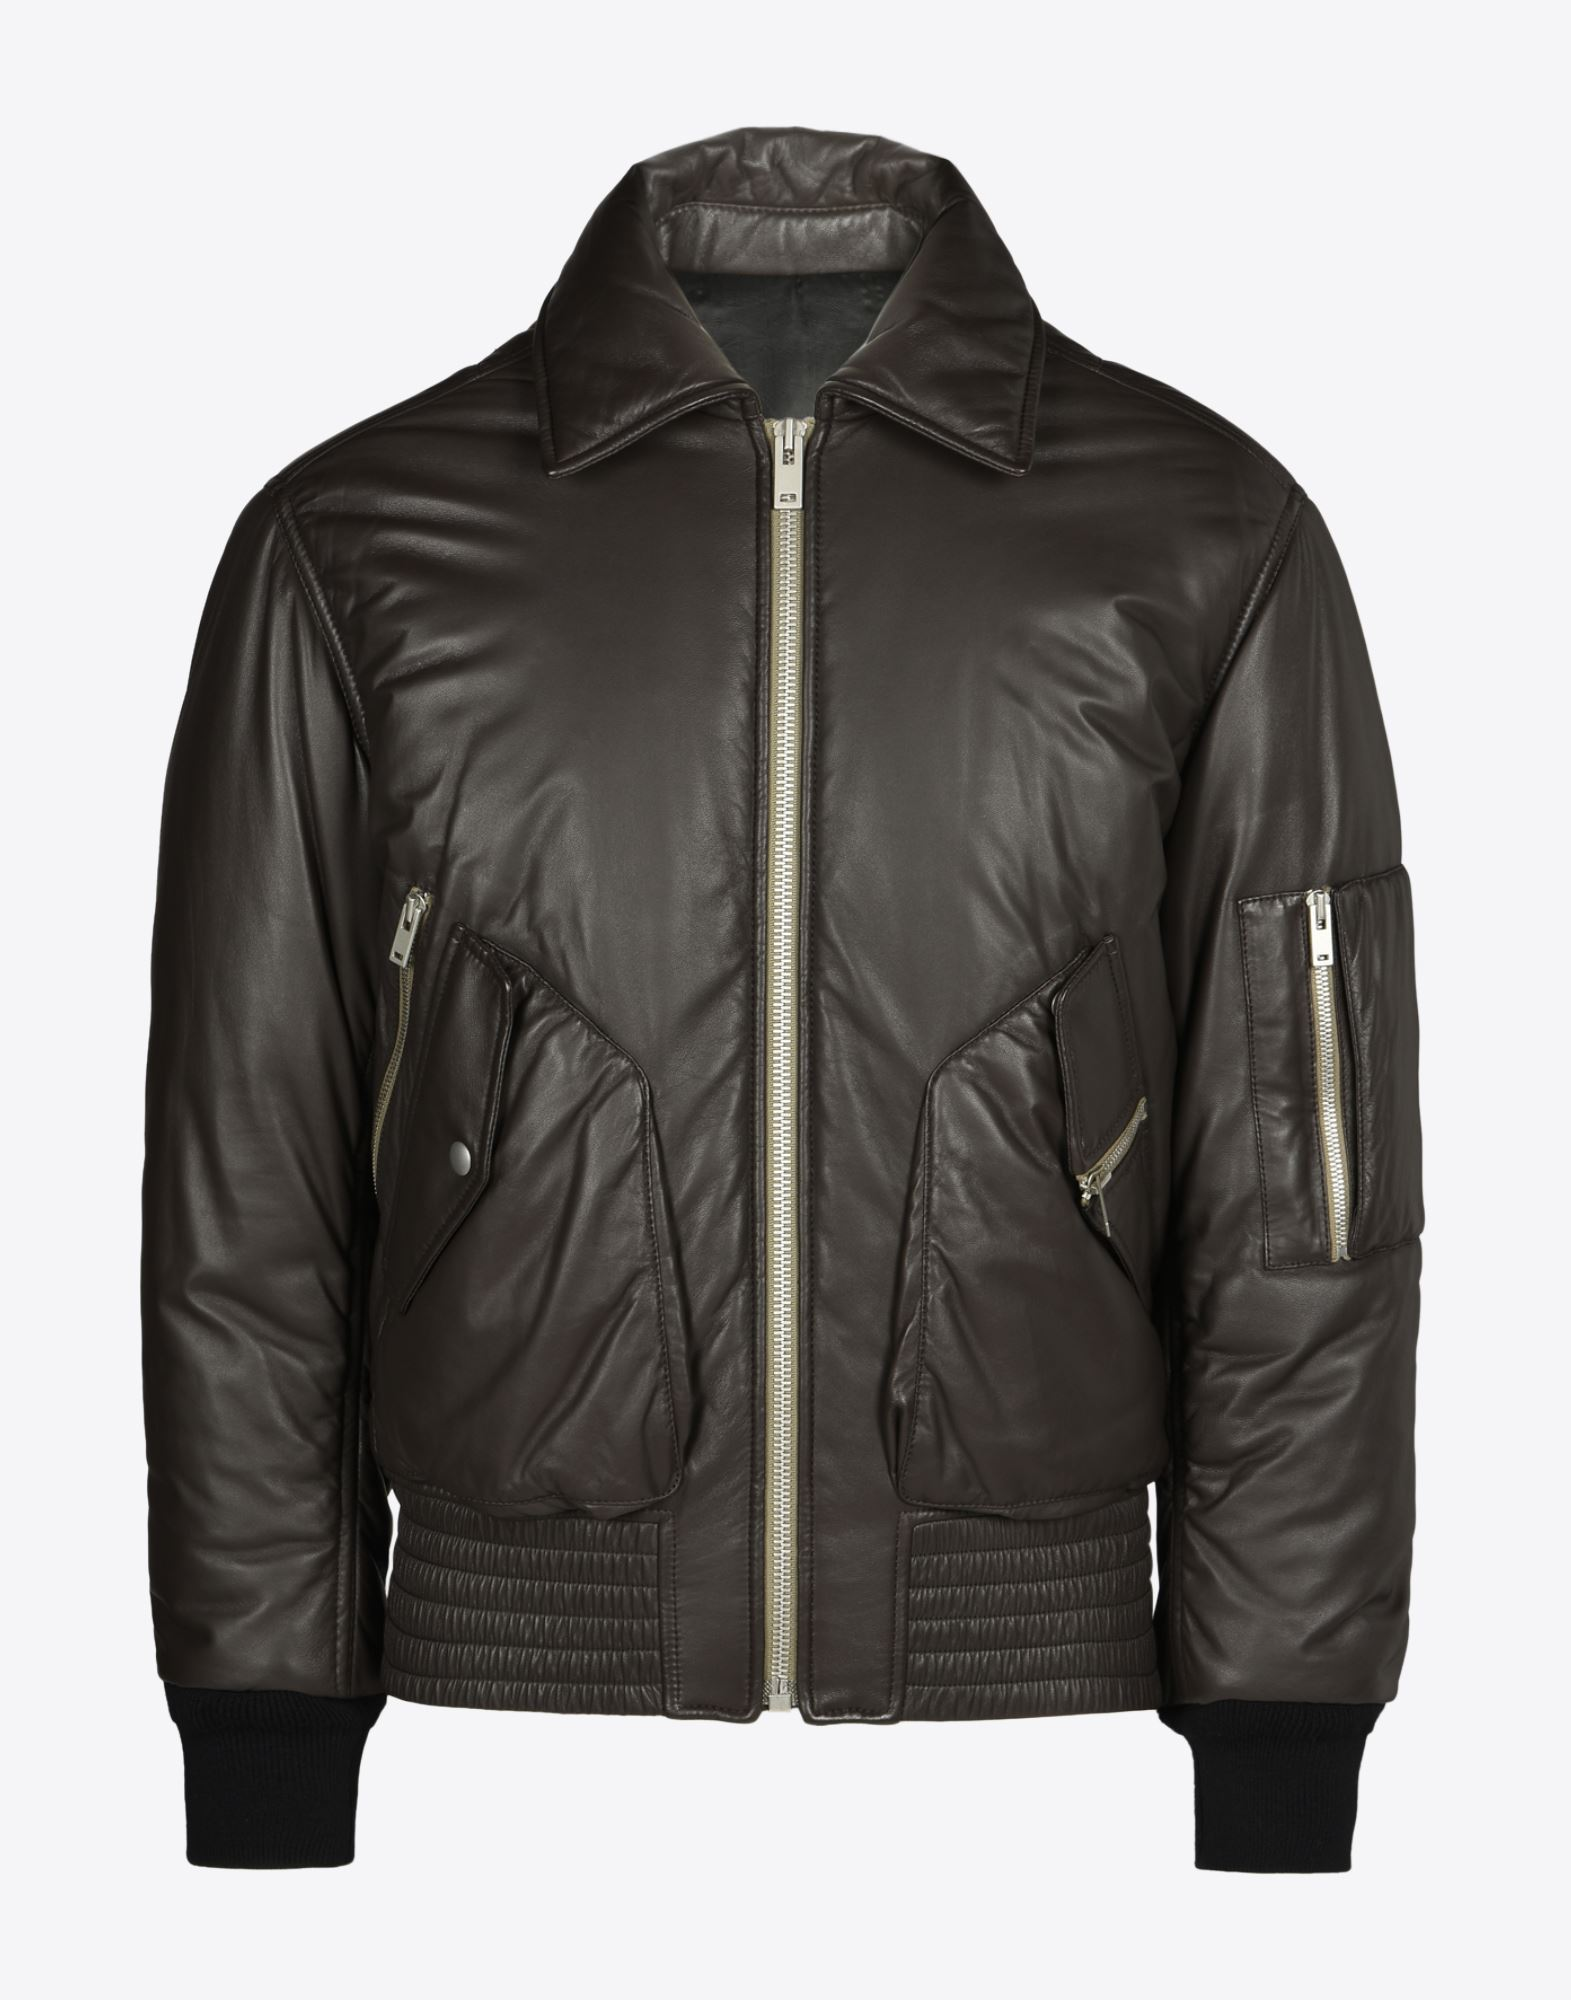 e8bb05d36 Maison Margiela Leather Bomber Jacket Men | Maison Margiela Store